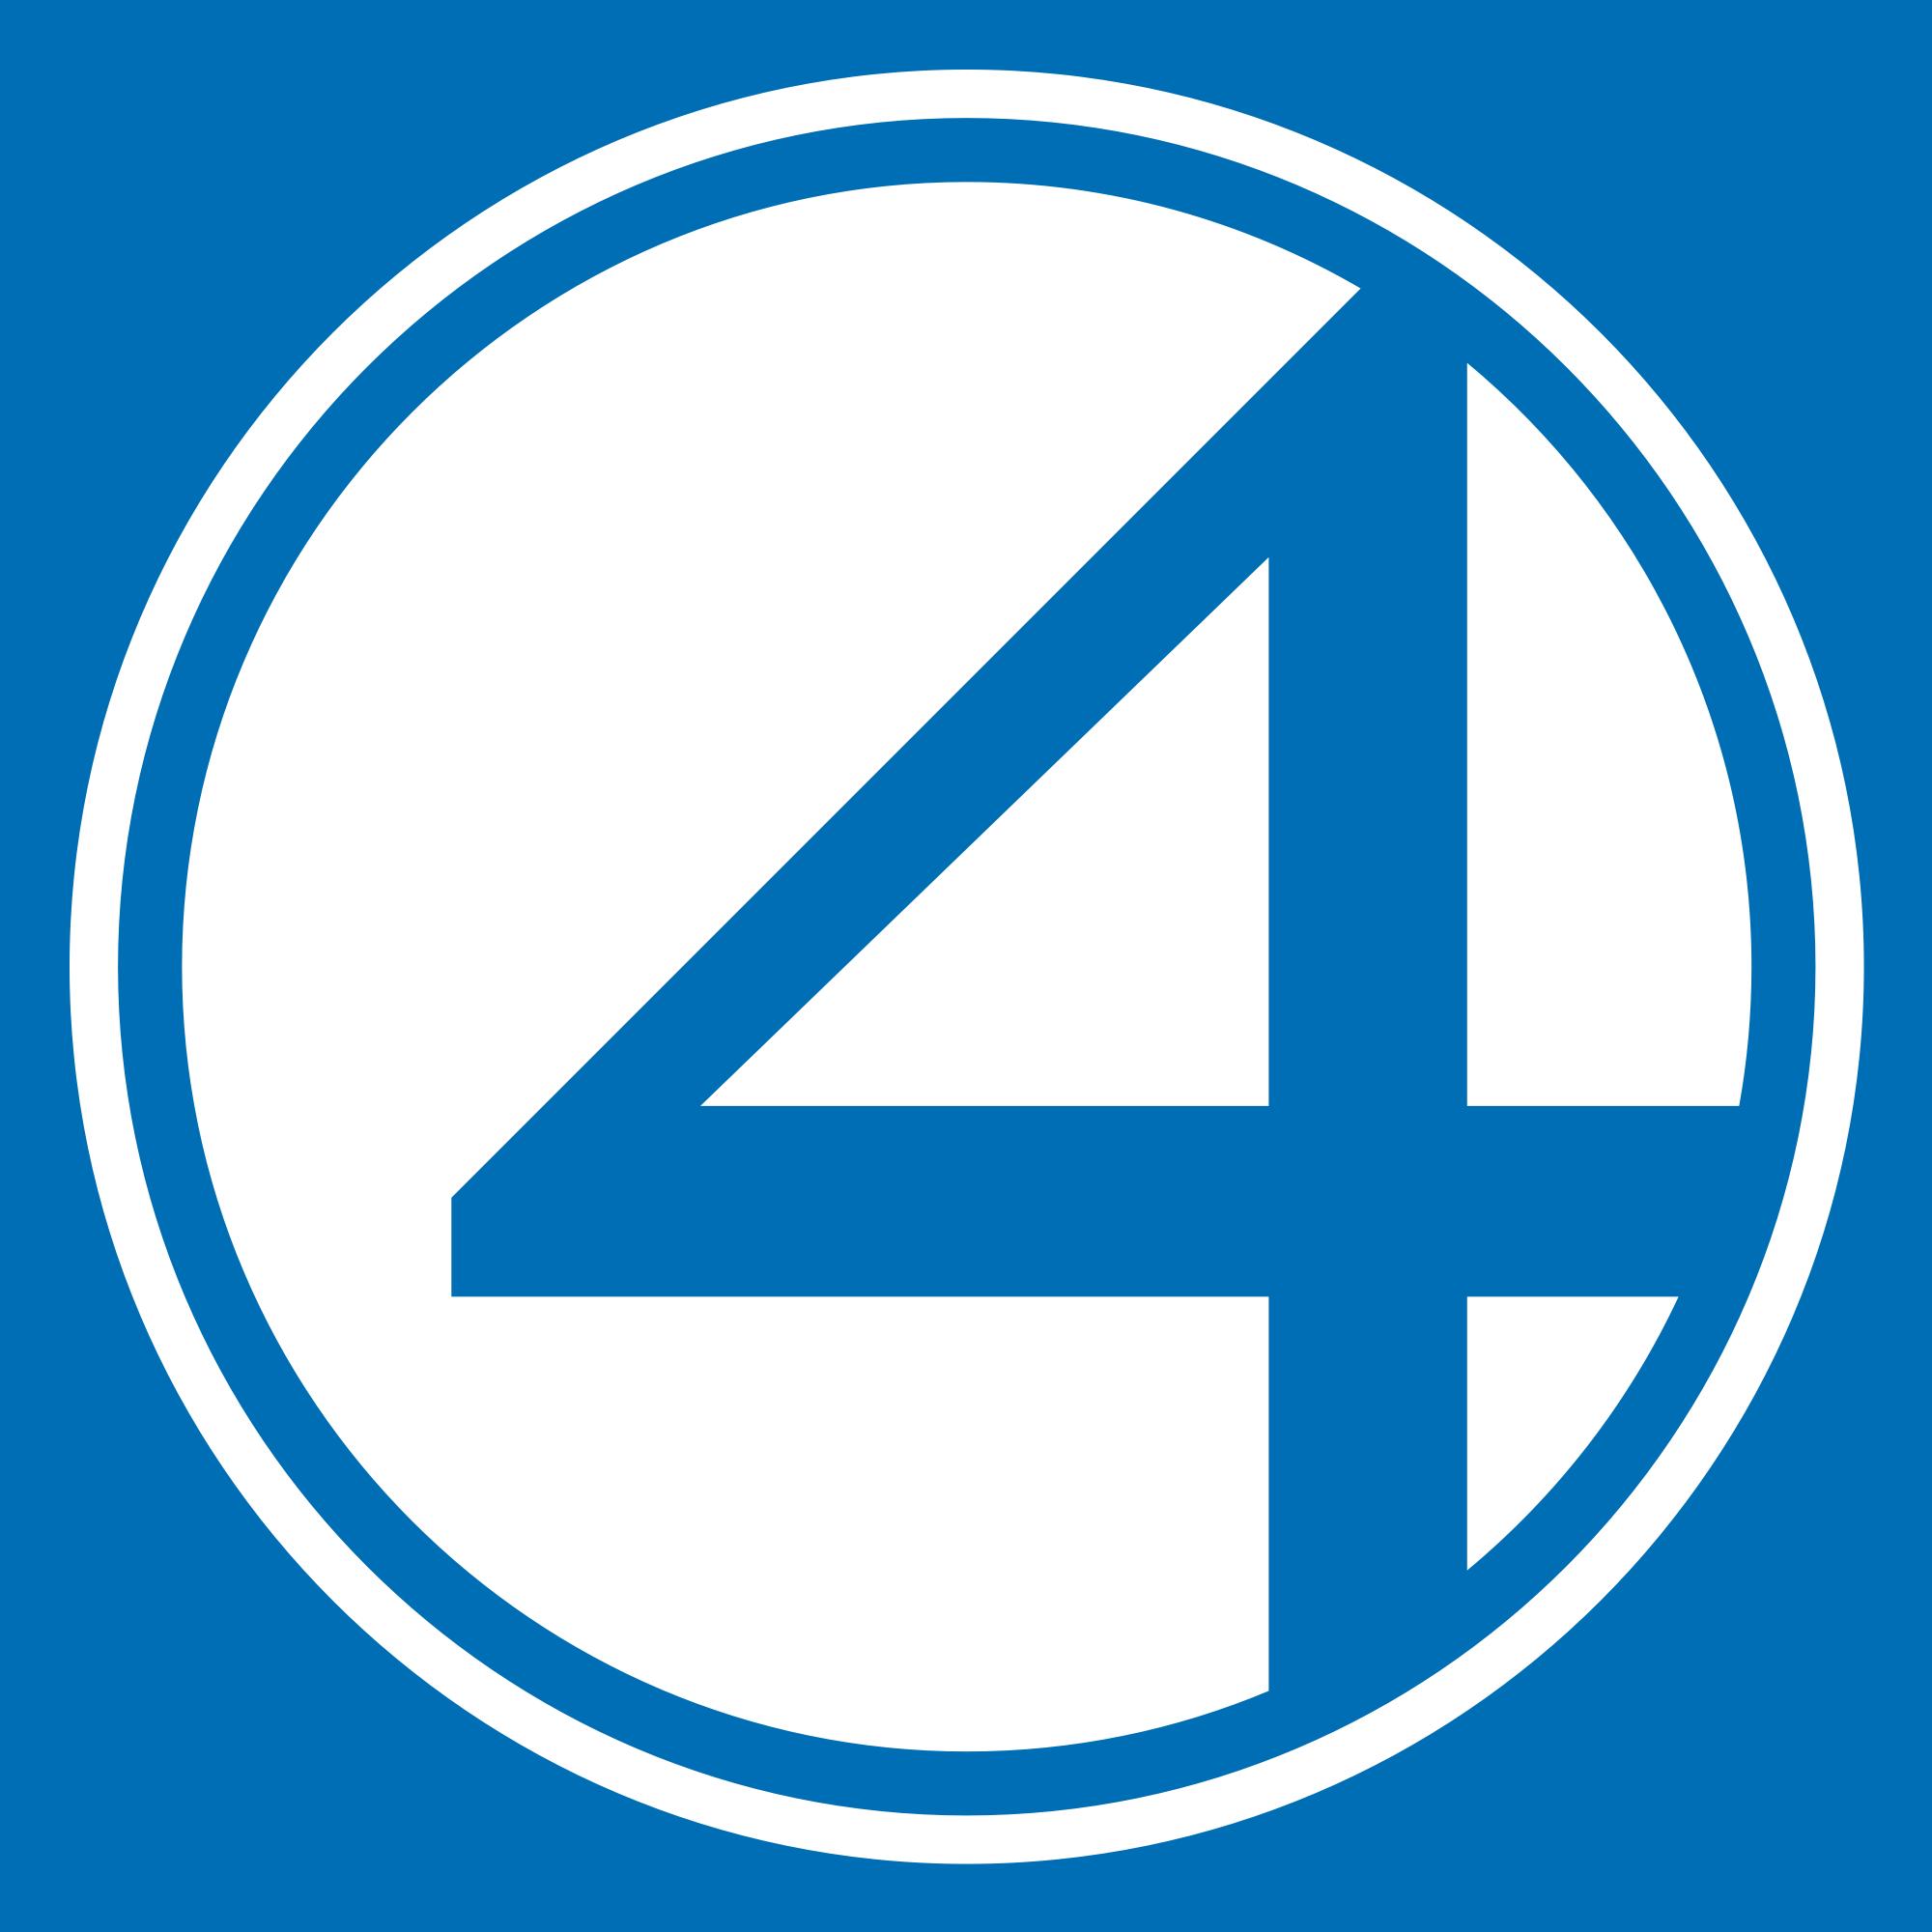 4 Fantastic Logo Buscar Con Google Fantastic Four Logo Fantastic Four All Marvel Superheroes